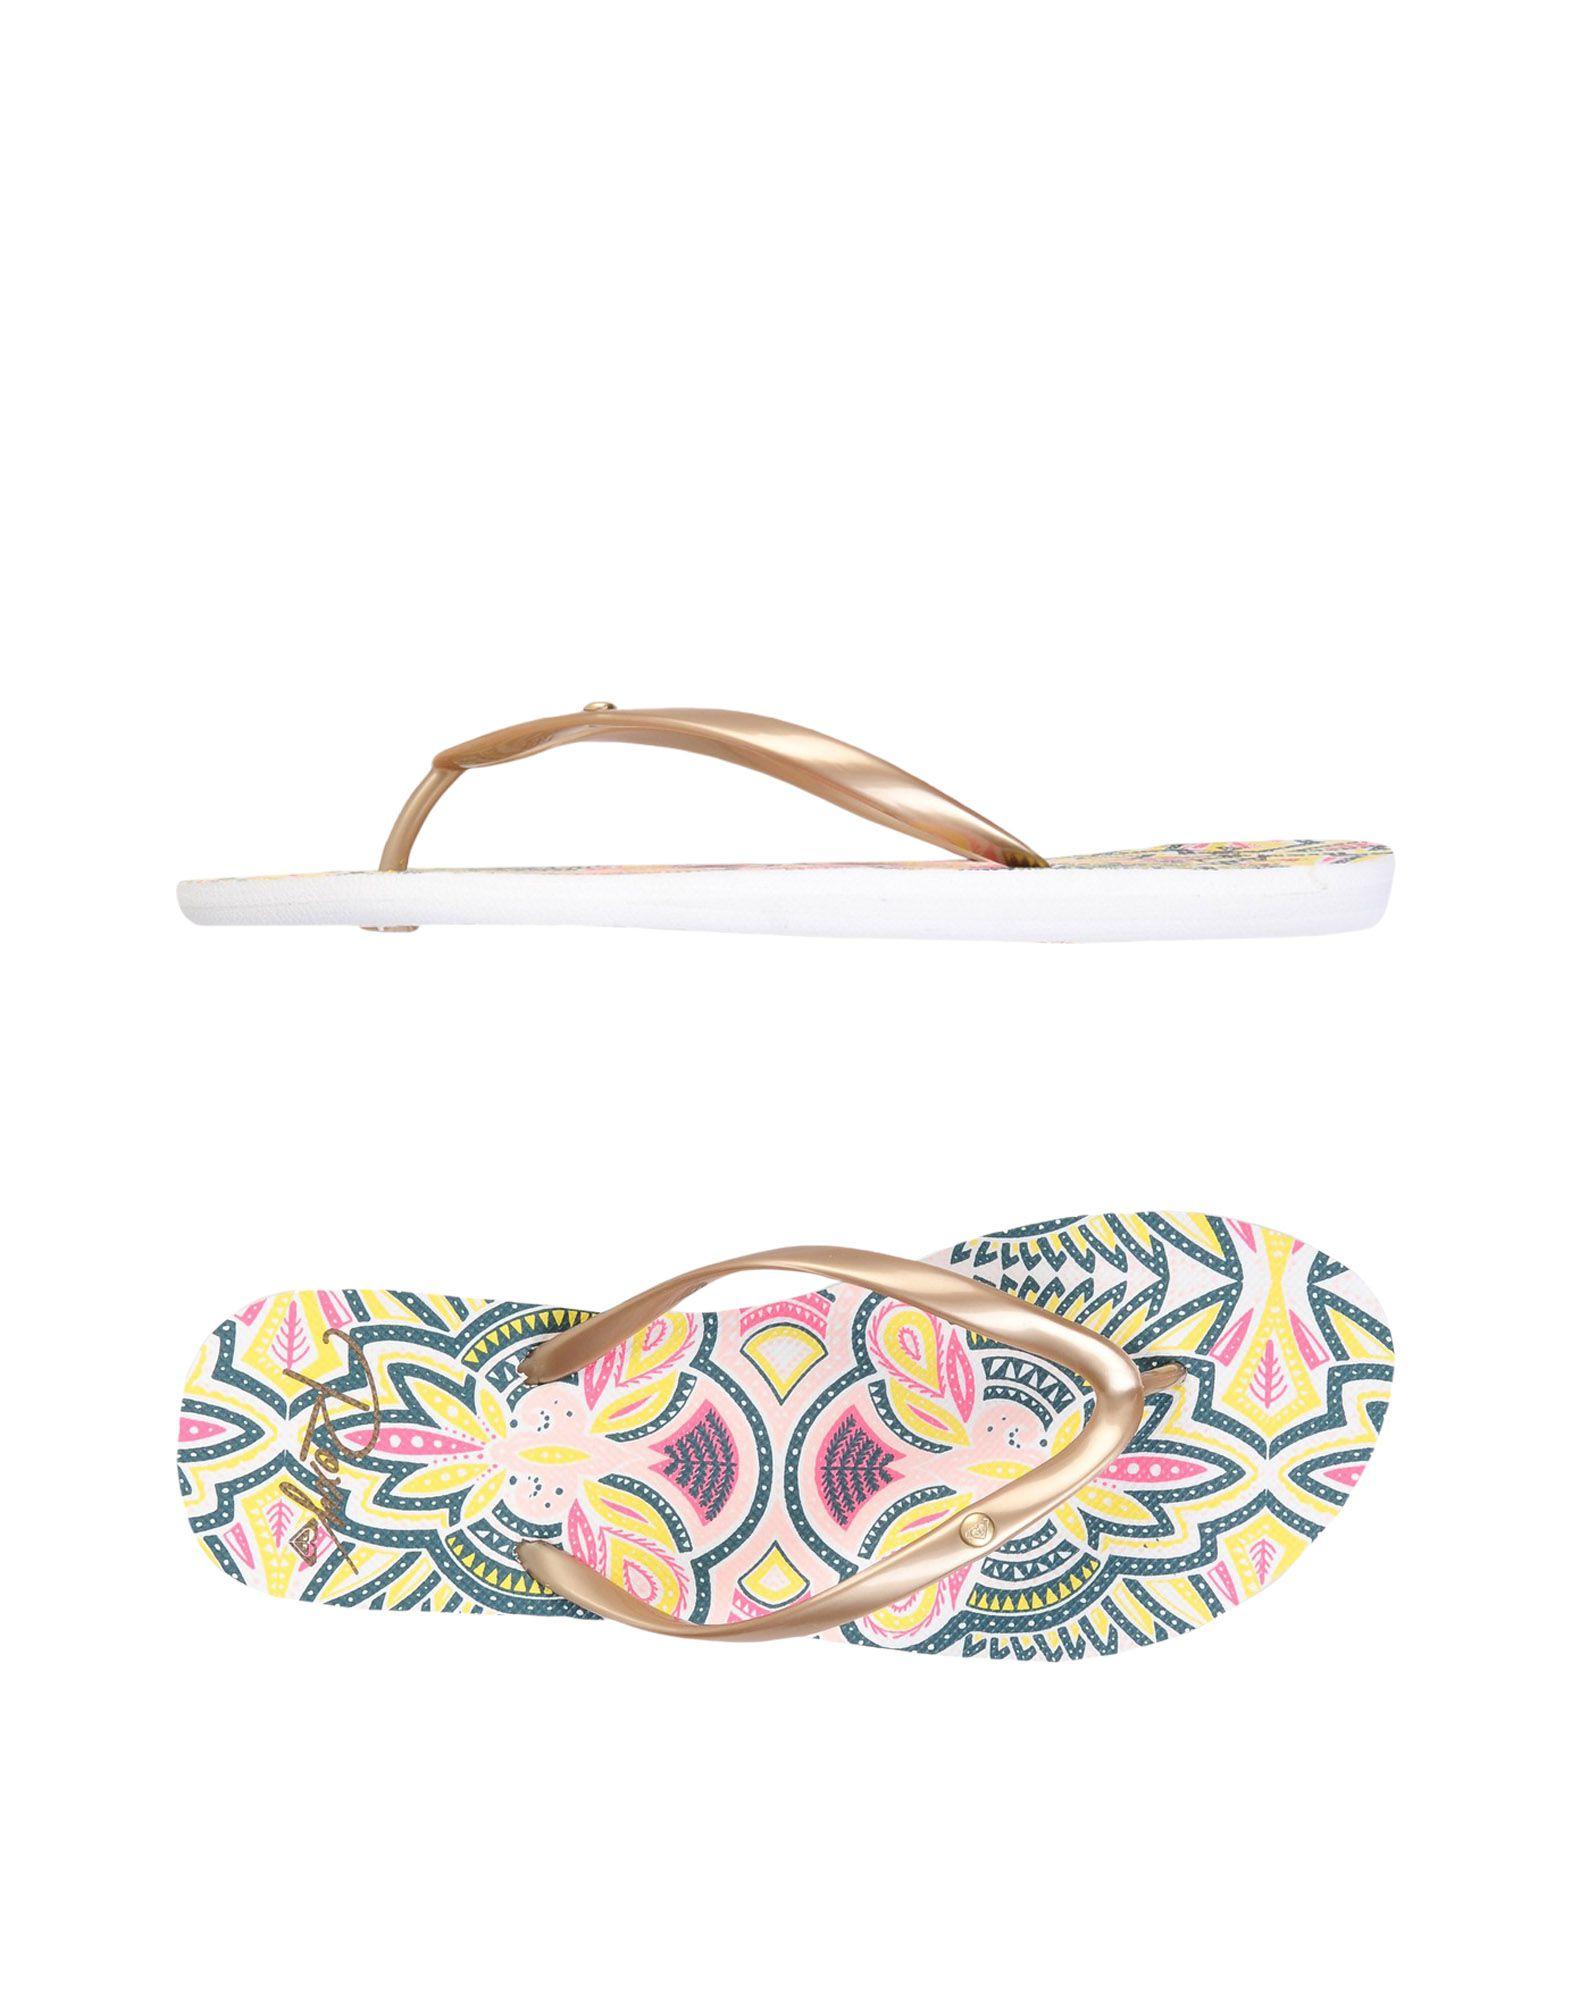 ROXY RX Sandals Portofino II Sandalias de dedo mujer 8EXw8VBM